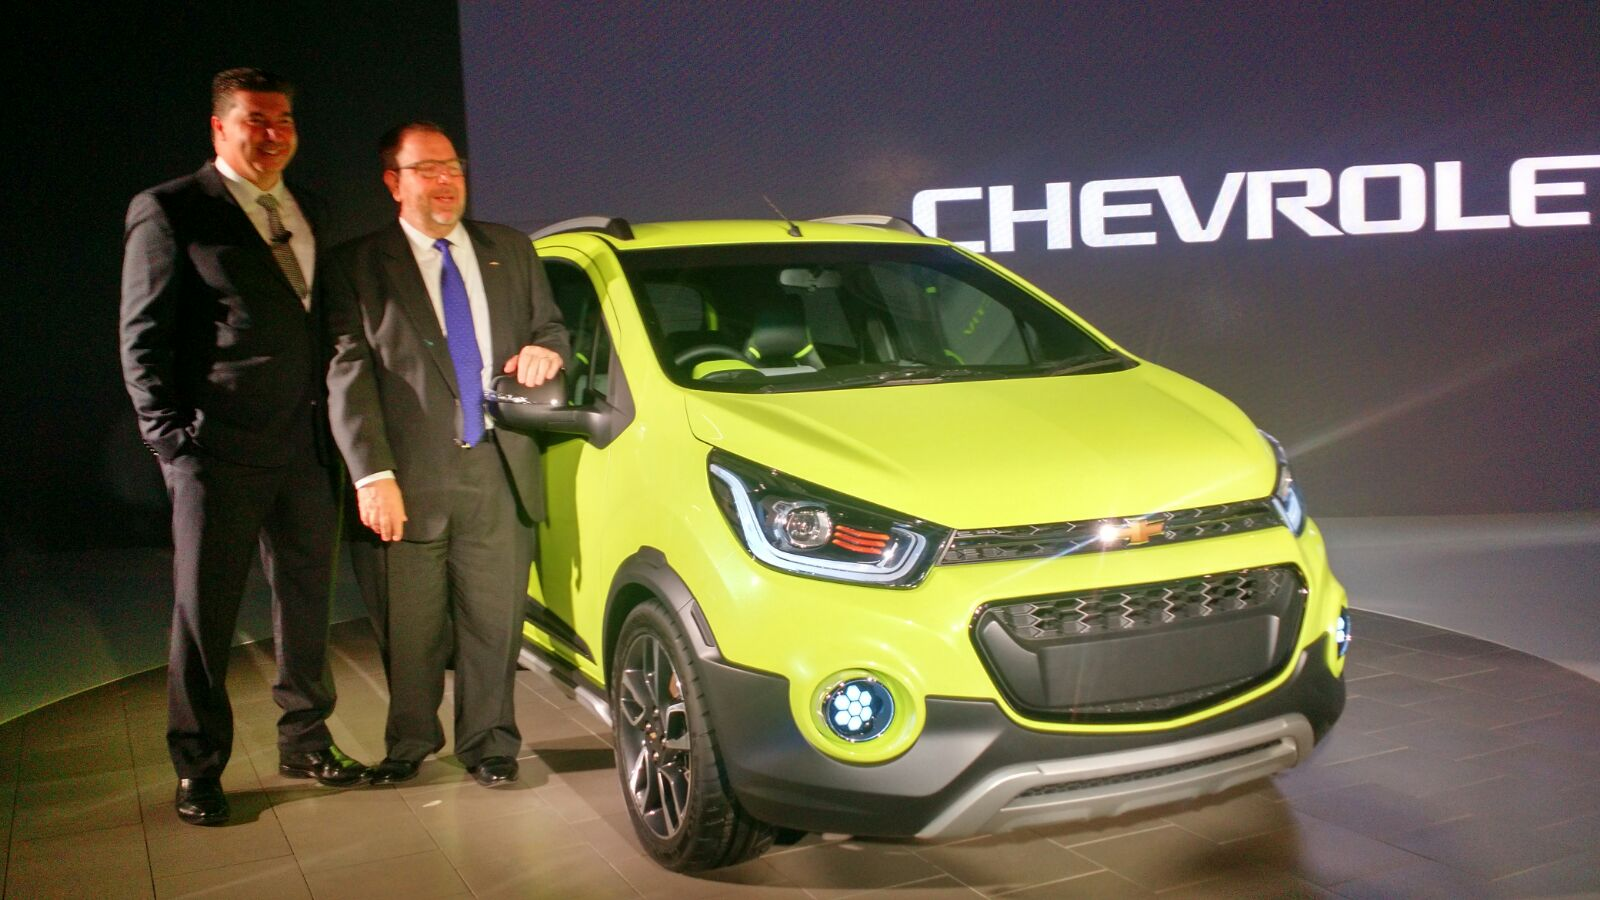 Chevrolet Cars At Auto Expo 2016